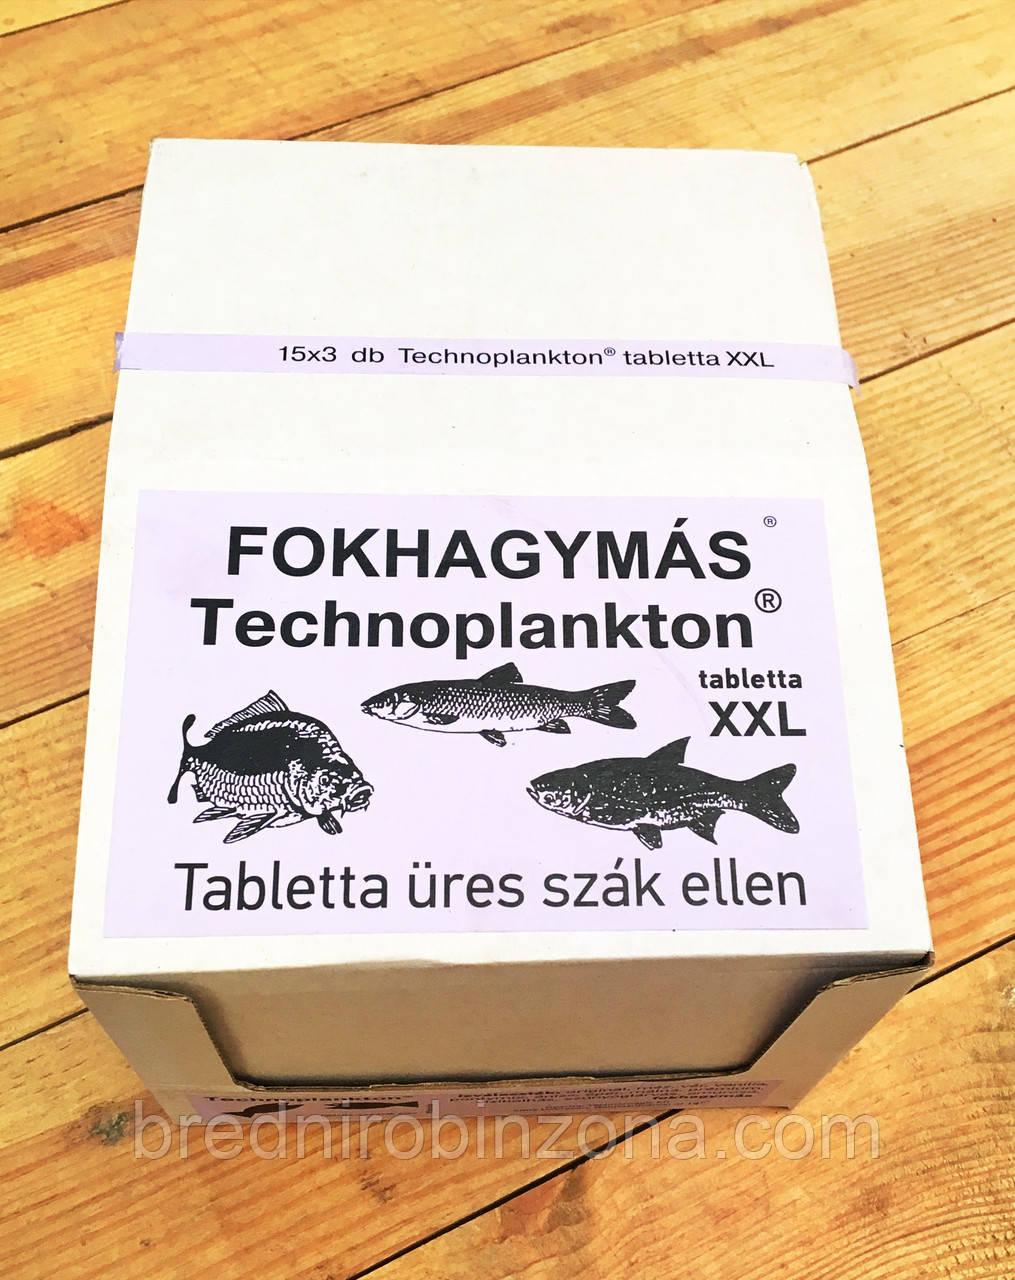 Технопланктон tabletta xxl FOKHAGYMAS